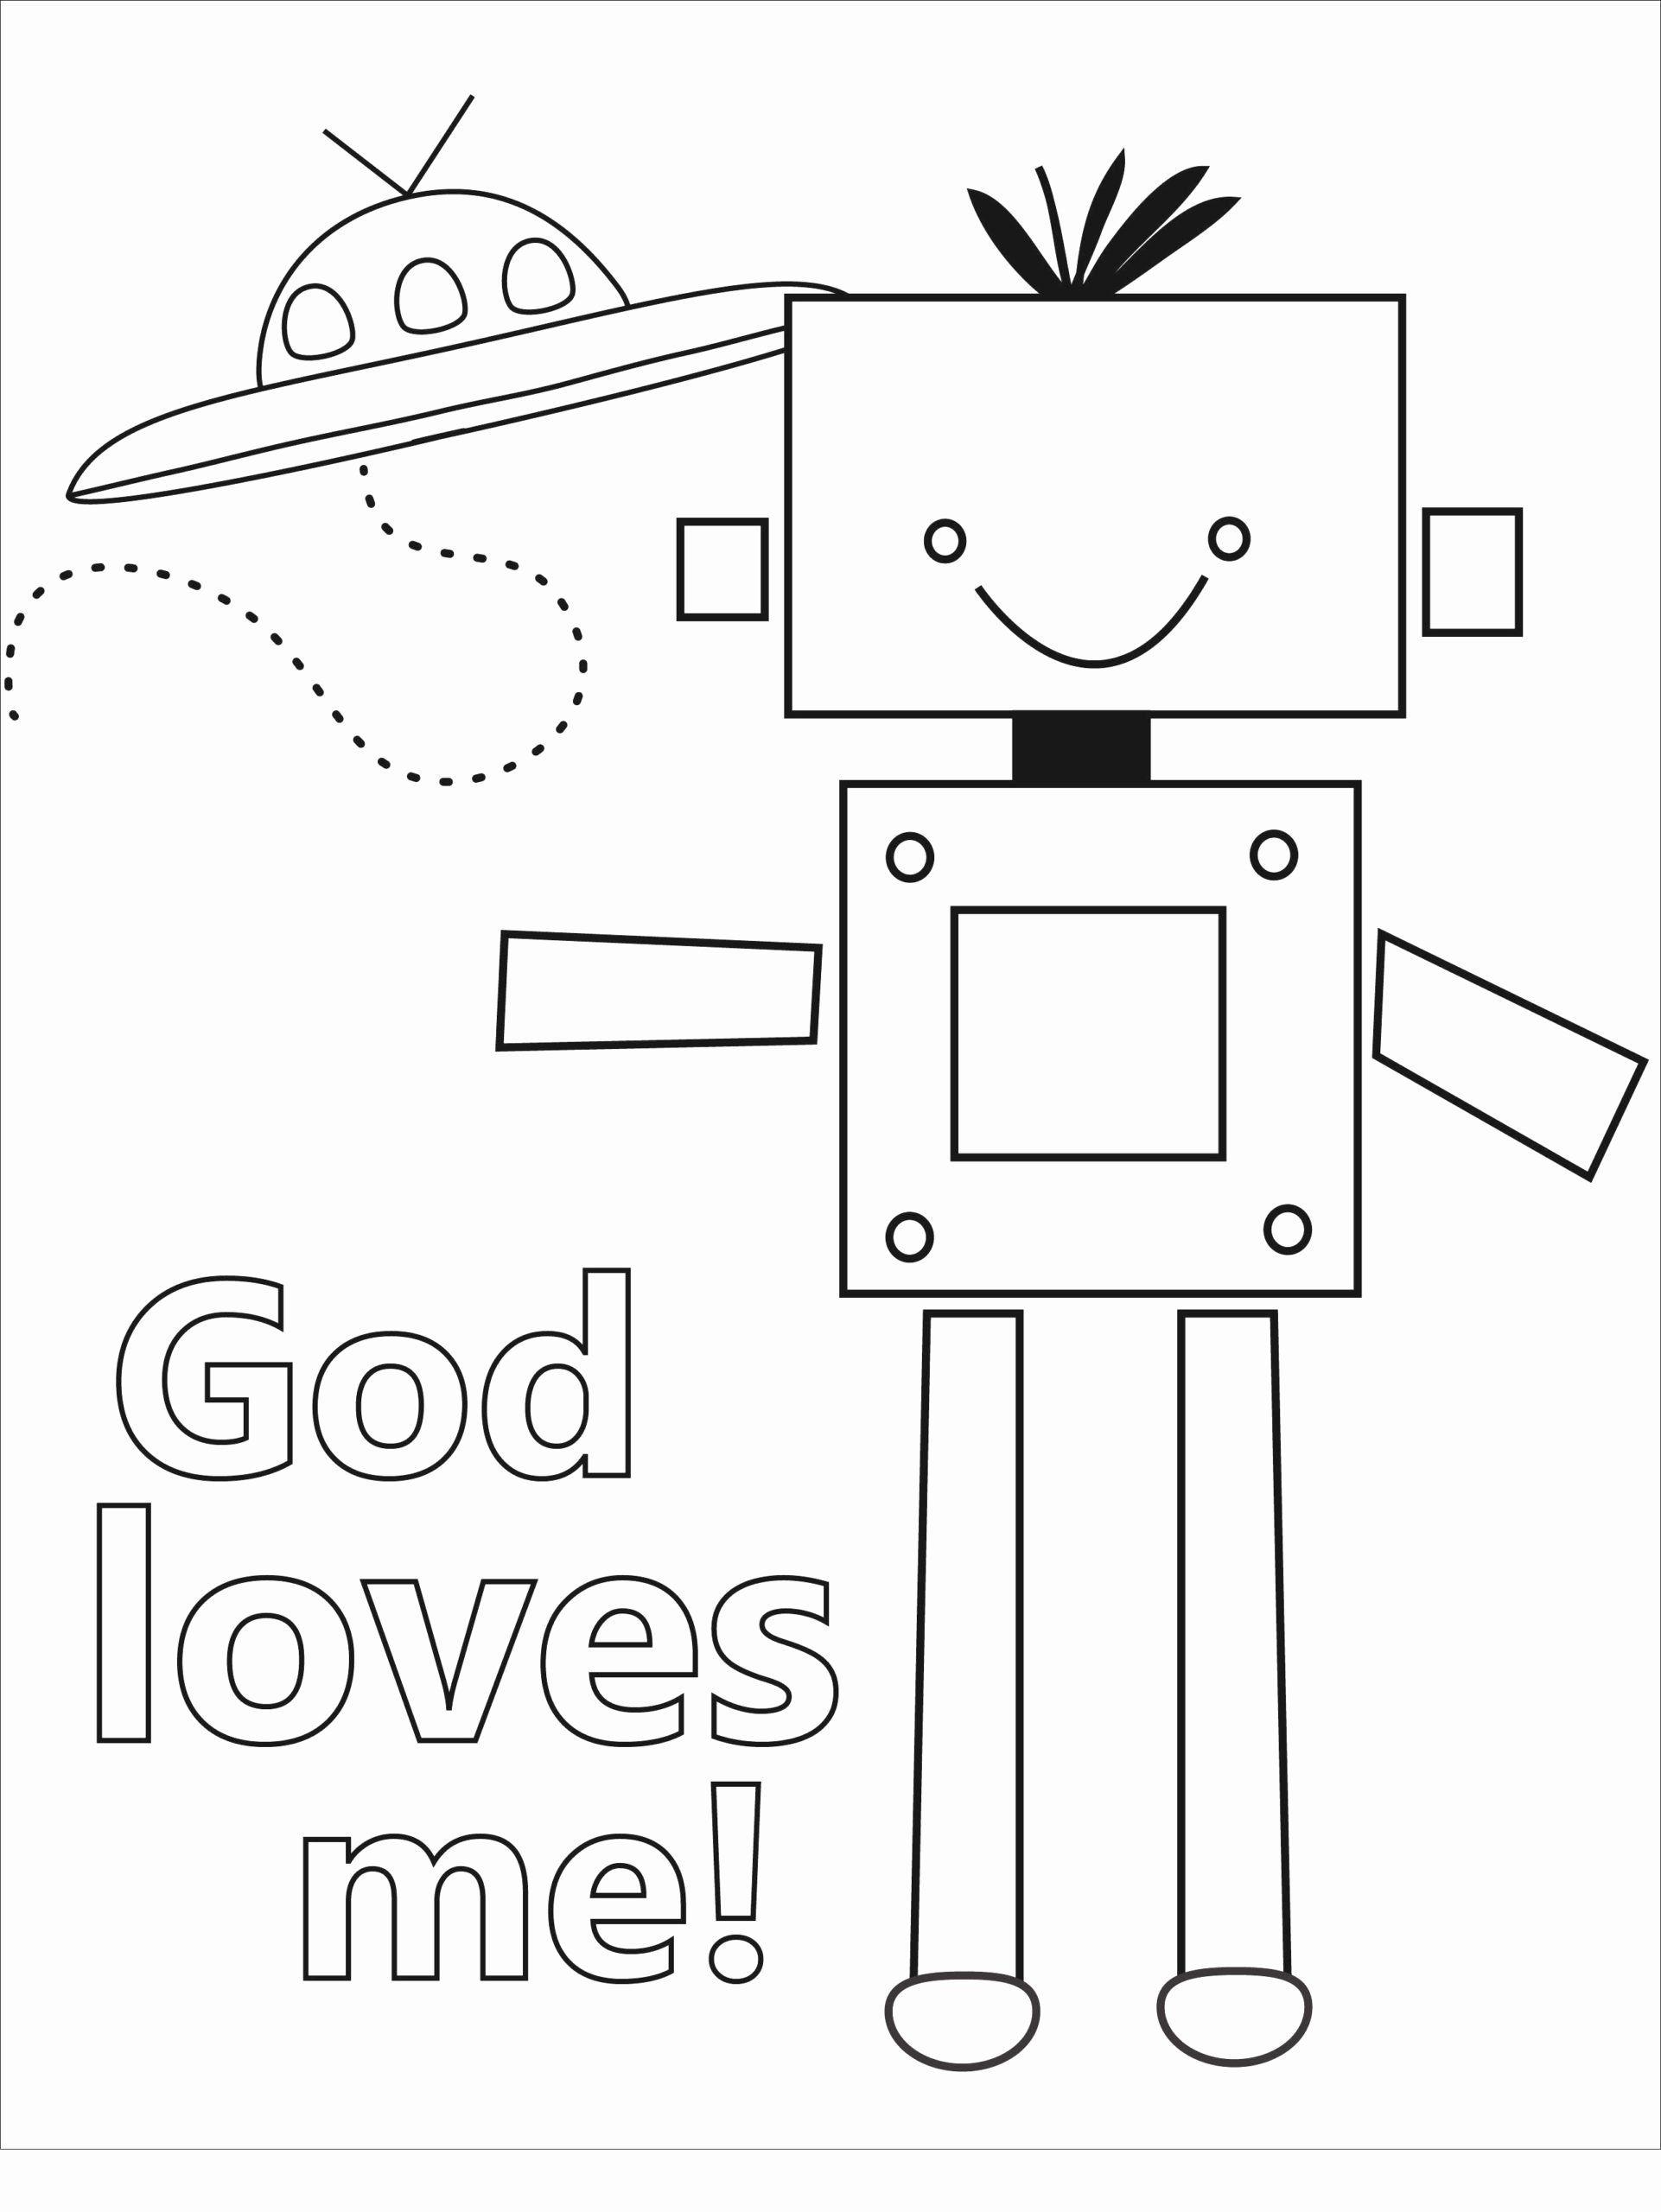 Jesus Love Coloring Pages Elegant Free Printable Coloring Pages Jesus Loves Me Love Coloring Pages Detailed Coloring Pages Coloring Pages